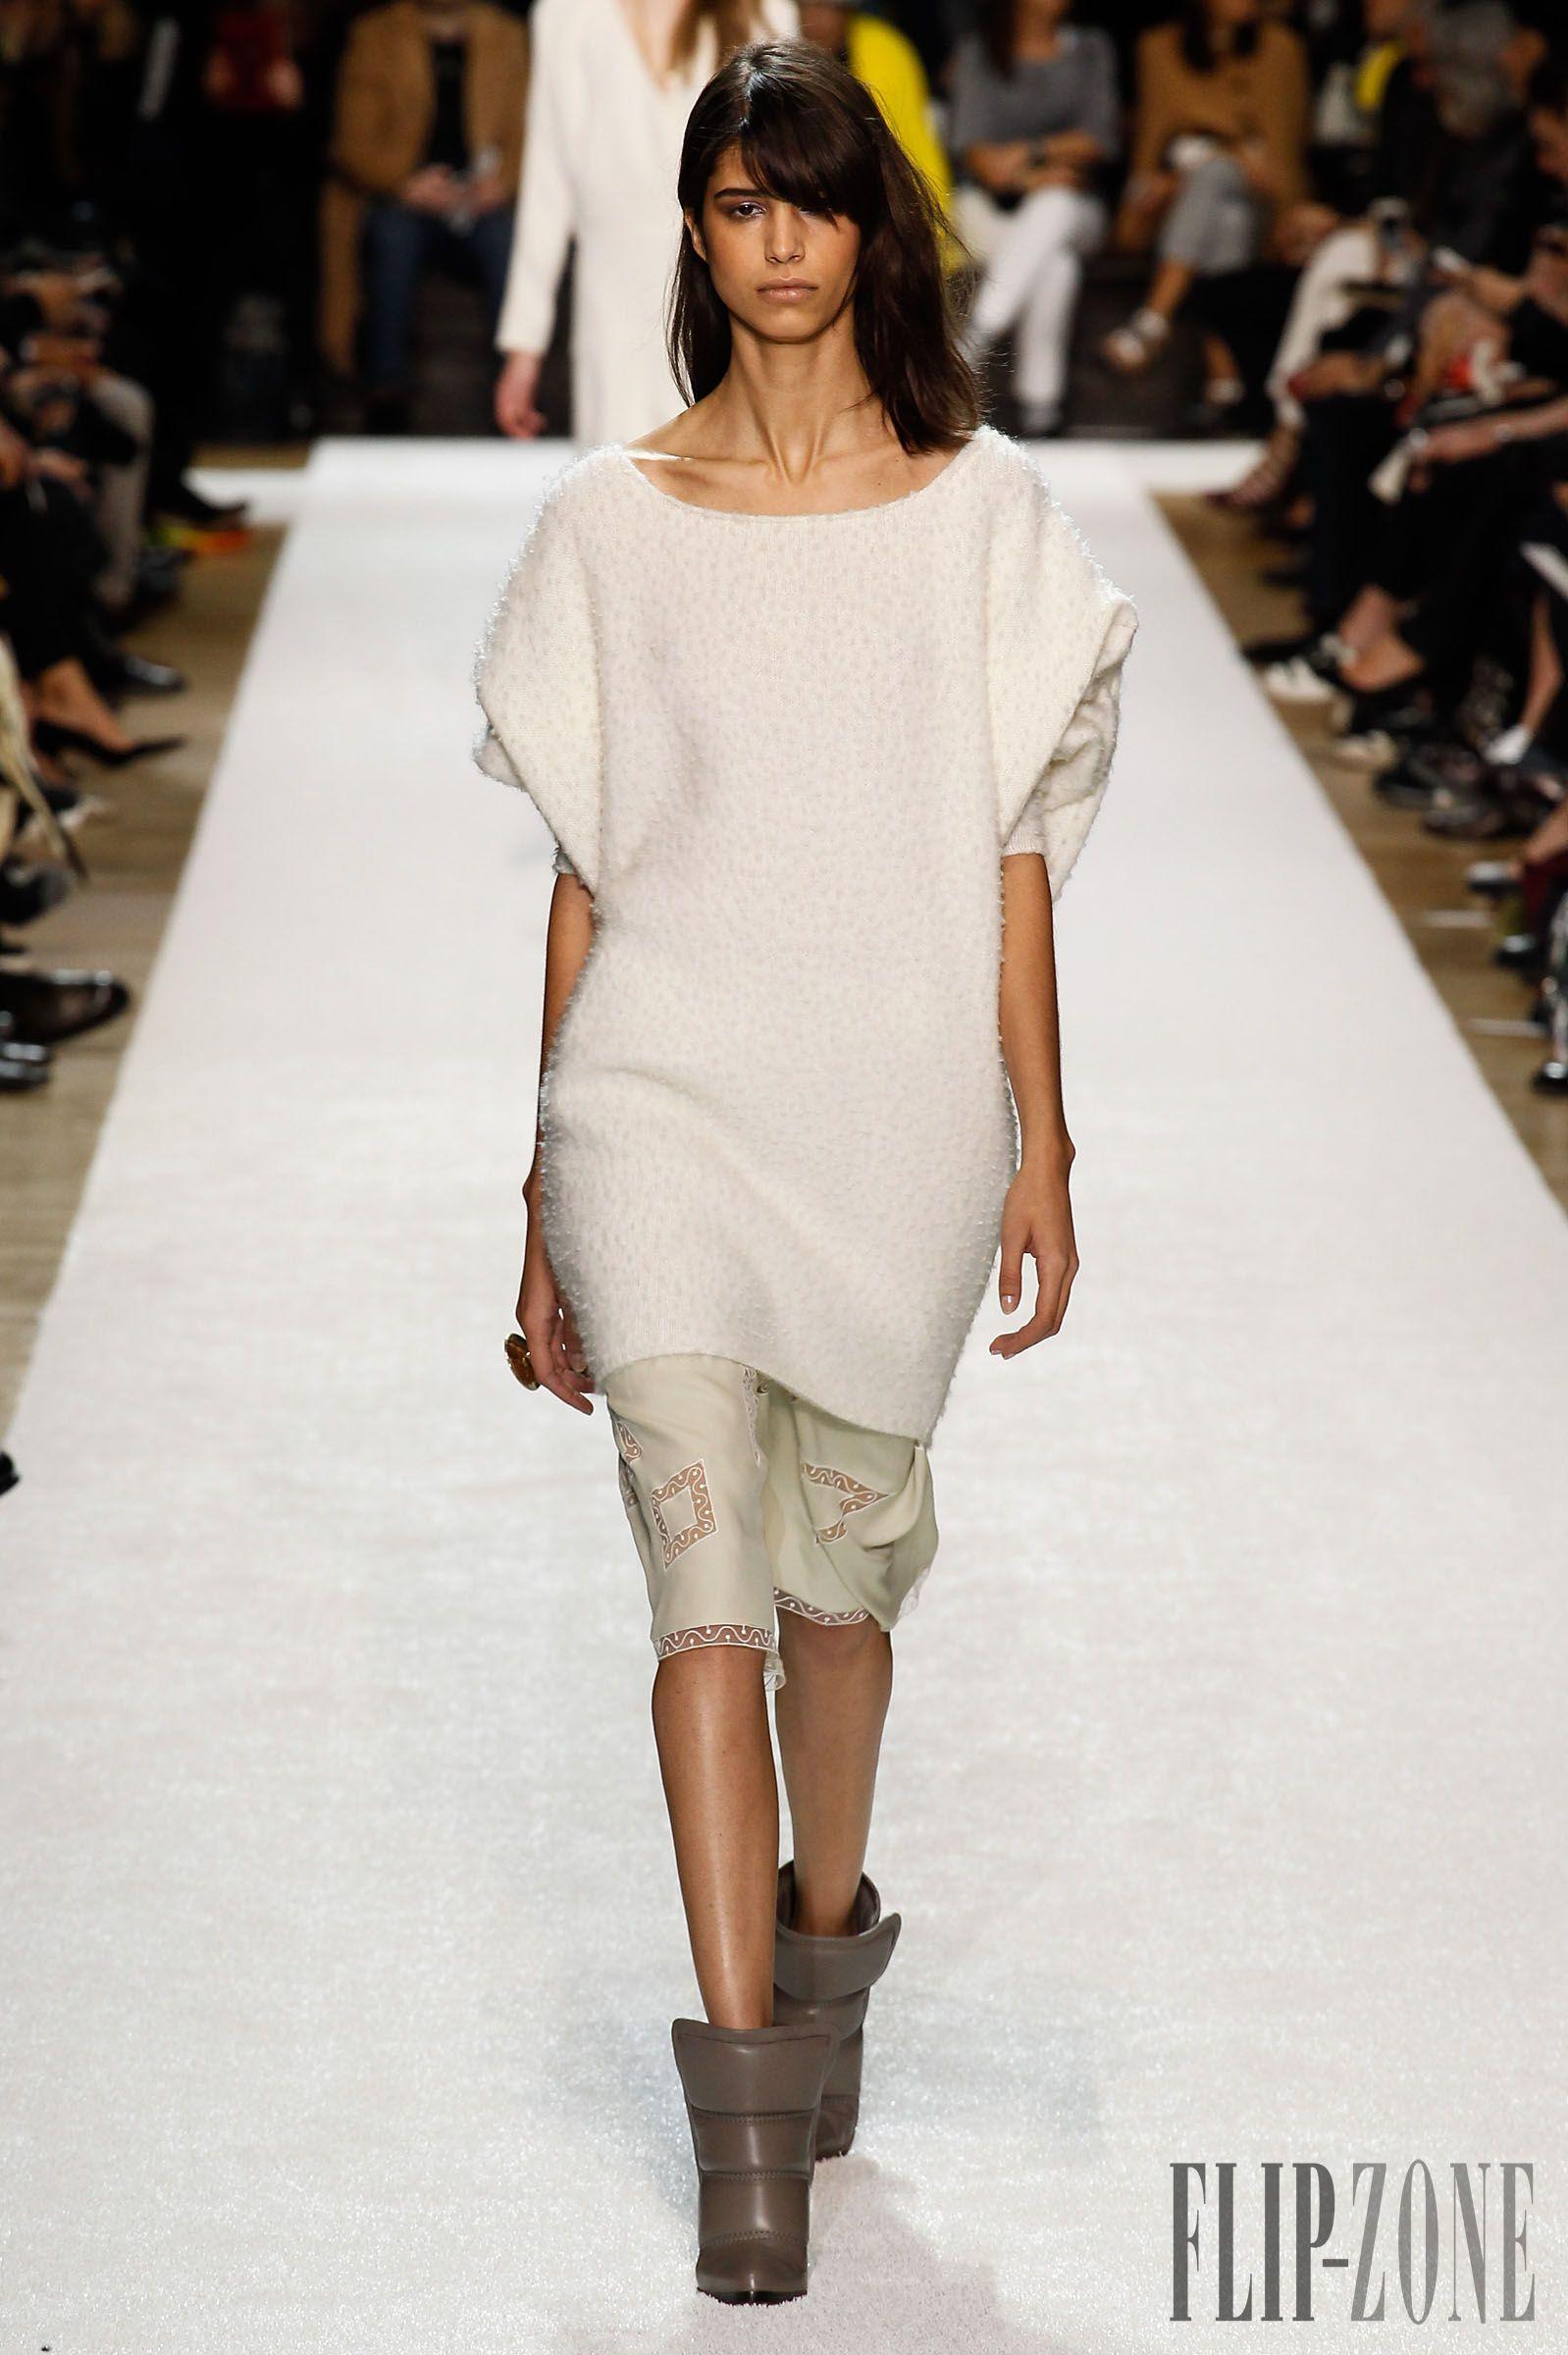 Chloé Fall-winter 2014-2015 - Ready-to-Wear - http://www.flip-zone.net/fashion/ready-to-wear/fashion-houses-42/chloe-4643 - ©PixelFormula